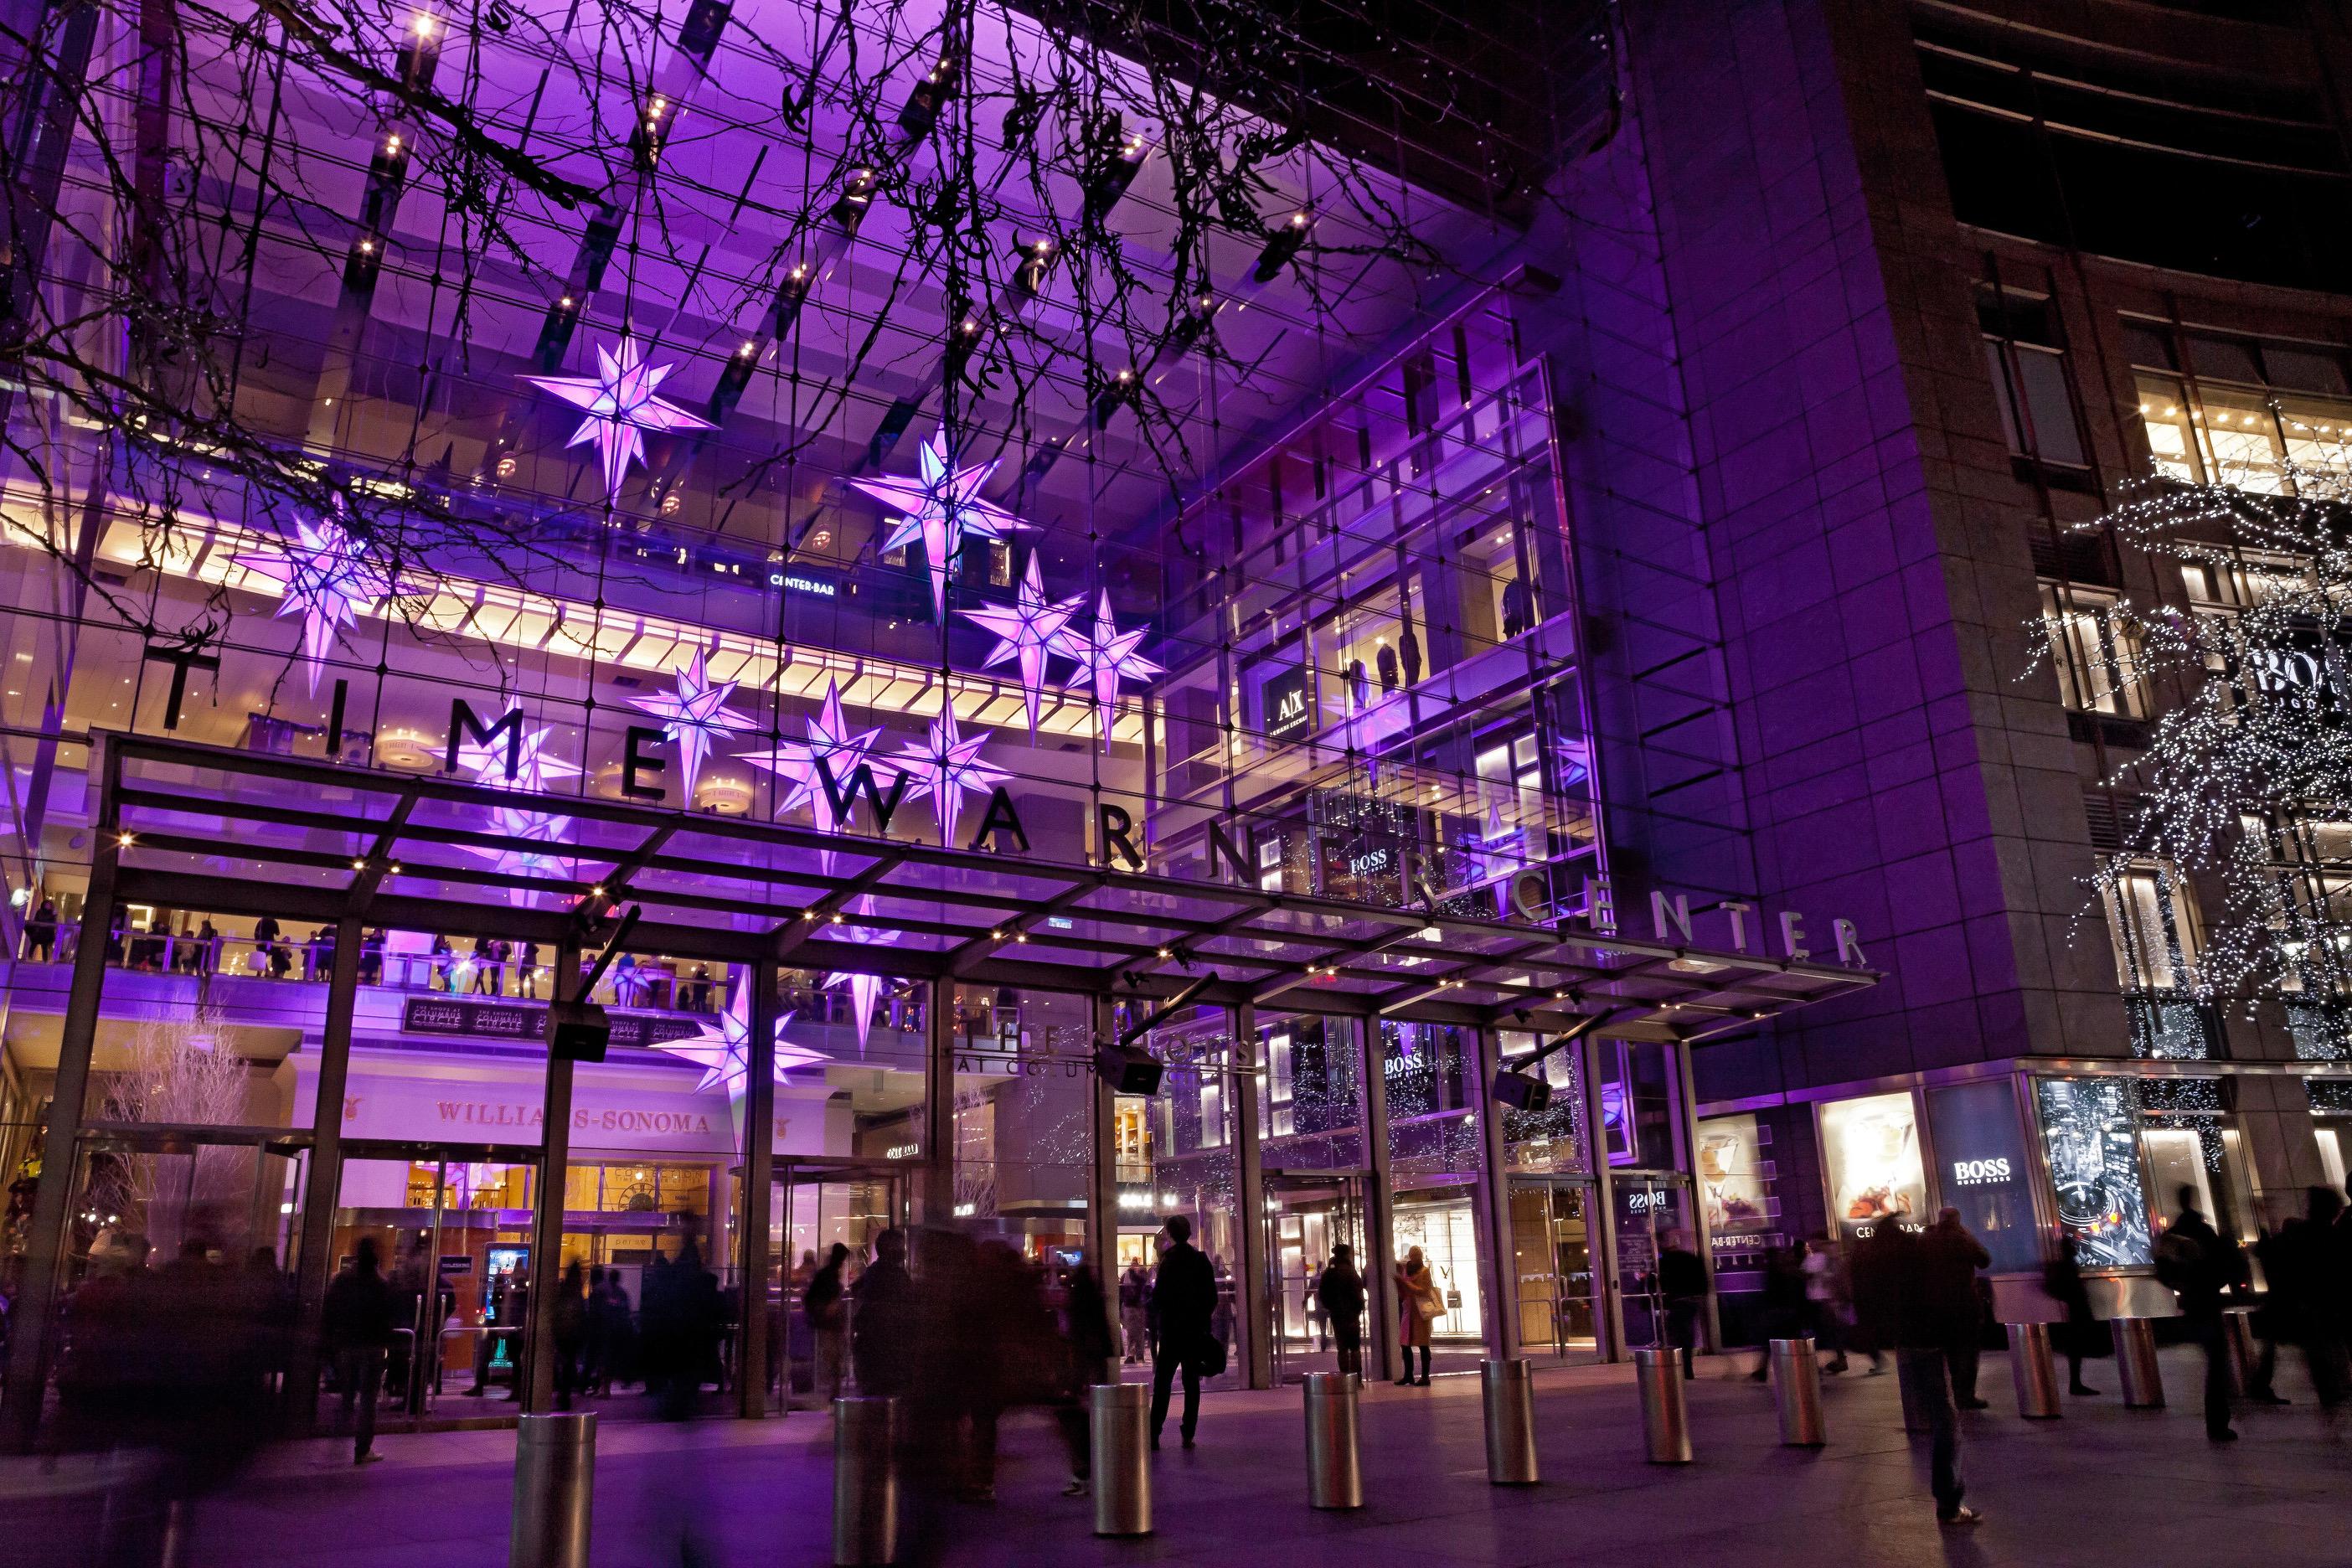 Third Annual Broadway Under the Stars at The Shops at Columbus Circle